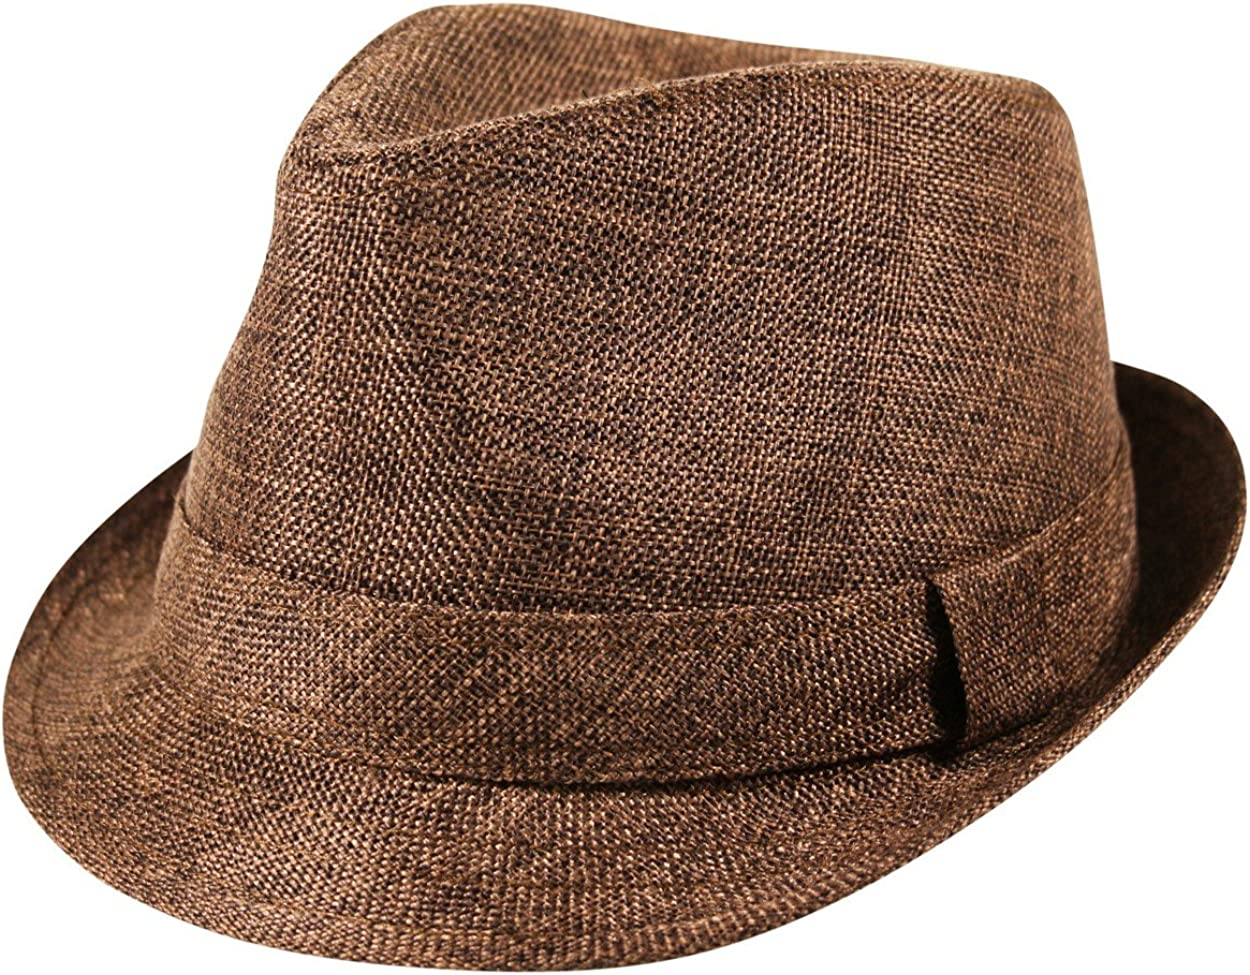 Itzu Trilby Fedora Hat Textured Jute Hessian Band Sun Unisex in Black Blue Brown Grey